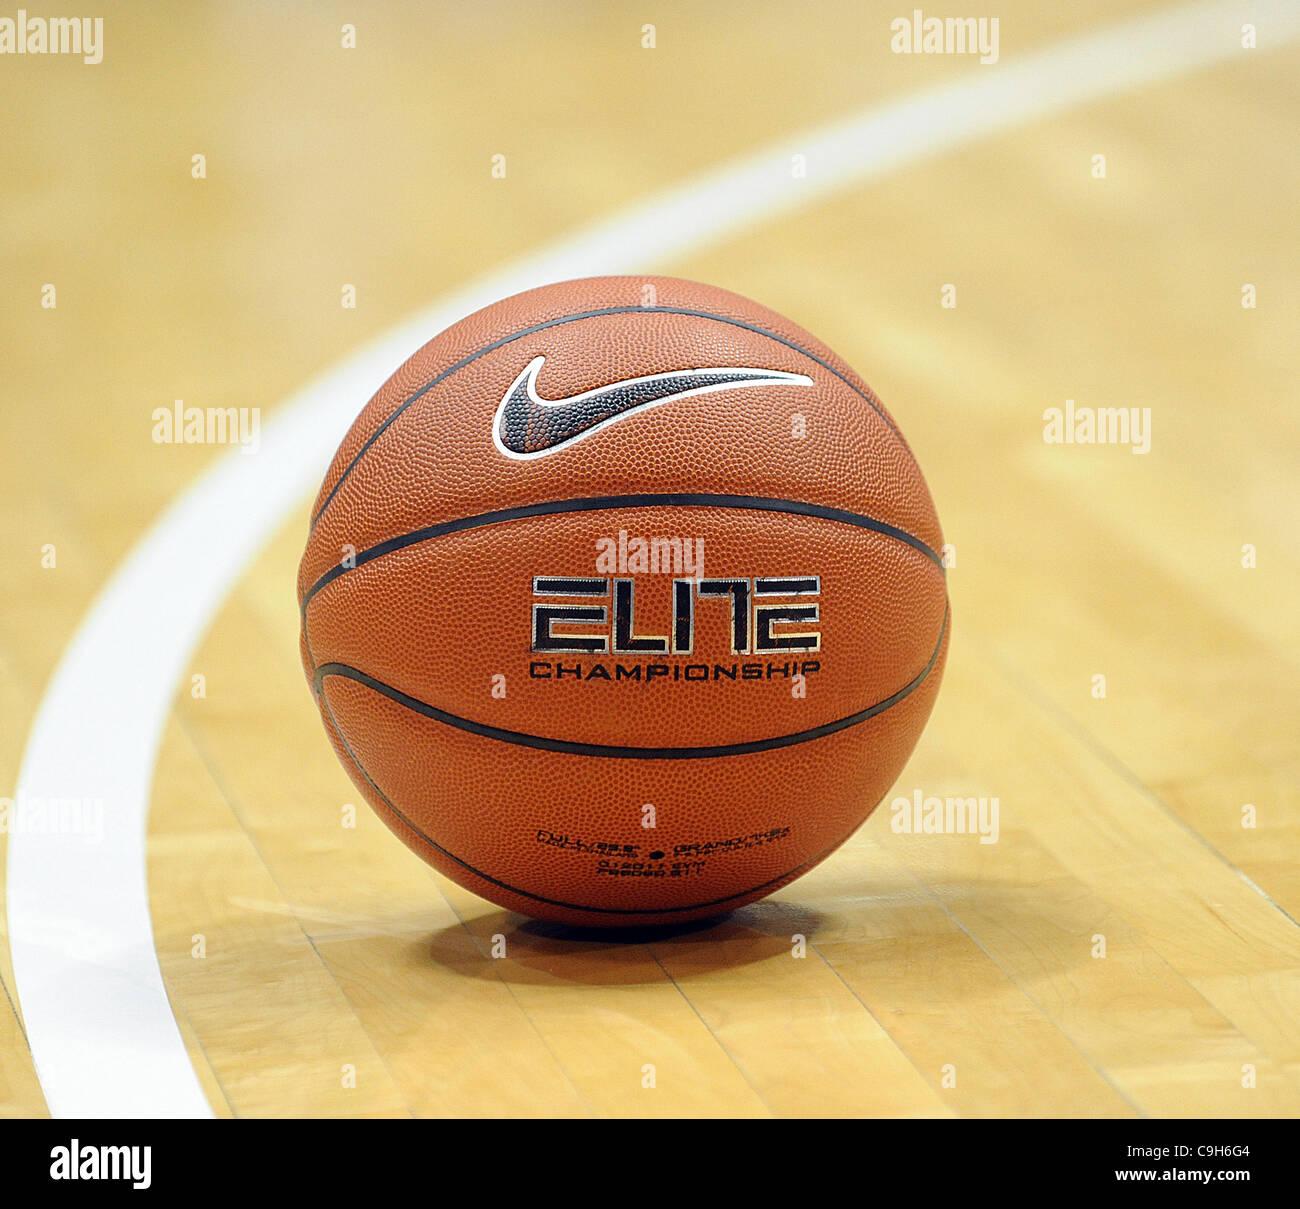 Jan. 01, 2012 - Chapel Hill, North Carolina; USA -  Basketball with a Nike Check as the University of North Carolina - Stock Image